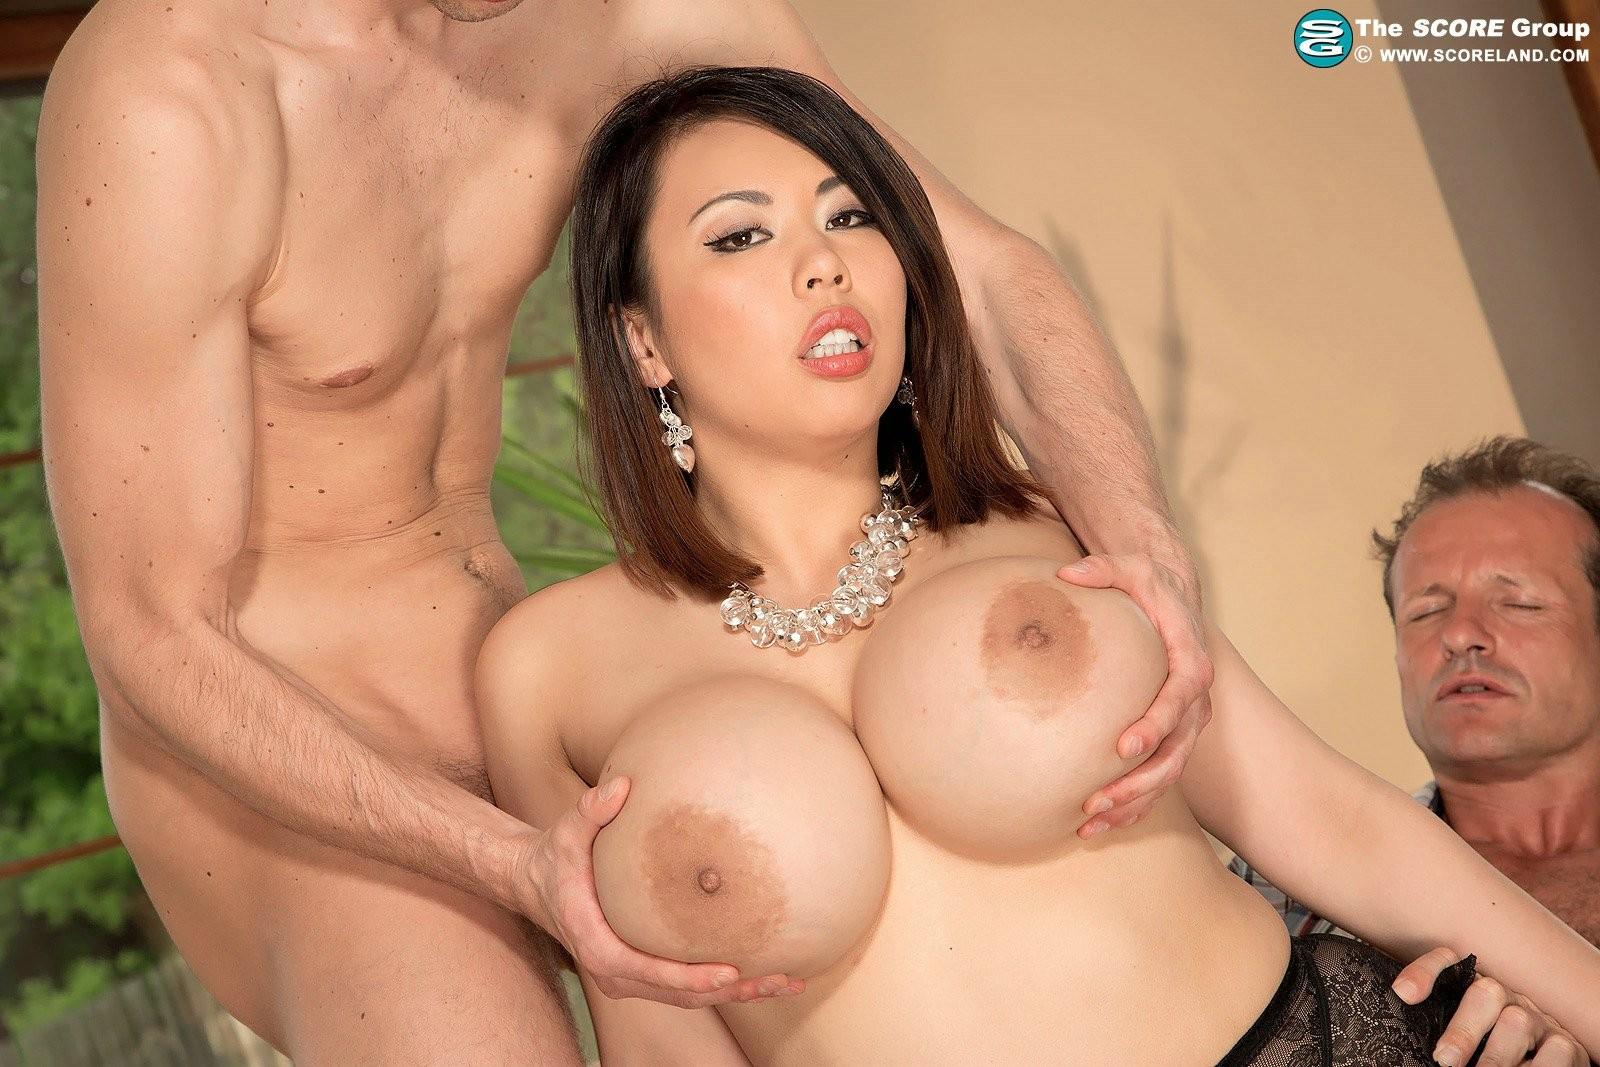 Big Tits Milf Pornstar Hd